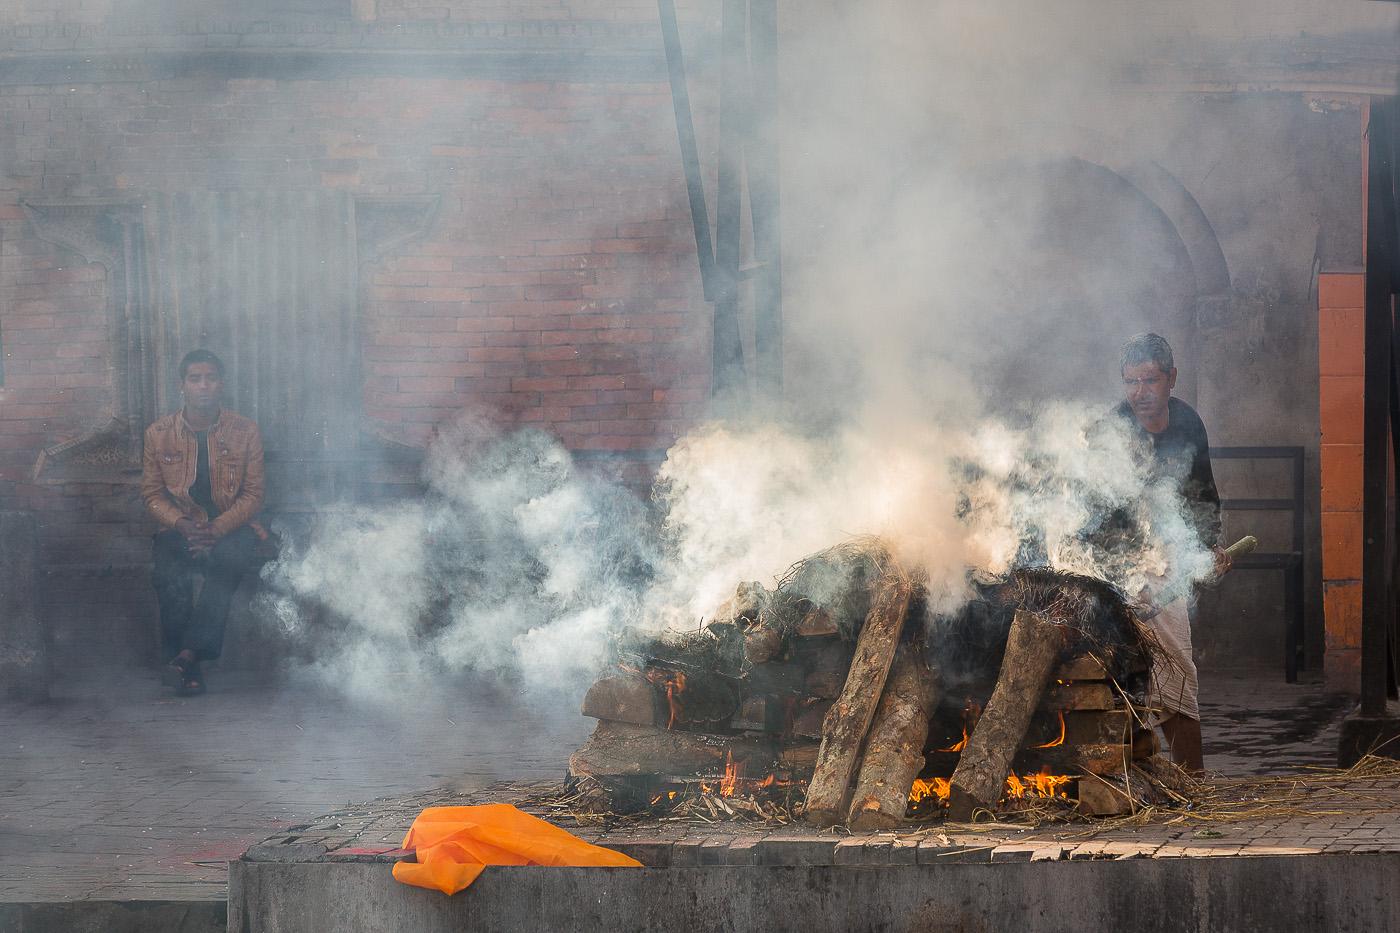 P38_109_020 A_MNPC_5_Funeral Pyre, Kathmandu_Ian Lyons.JPG